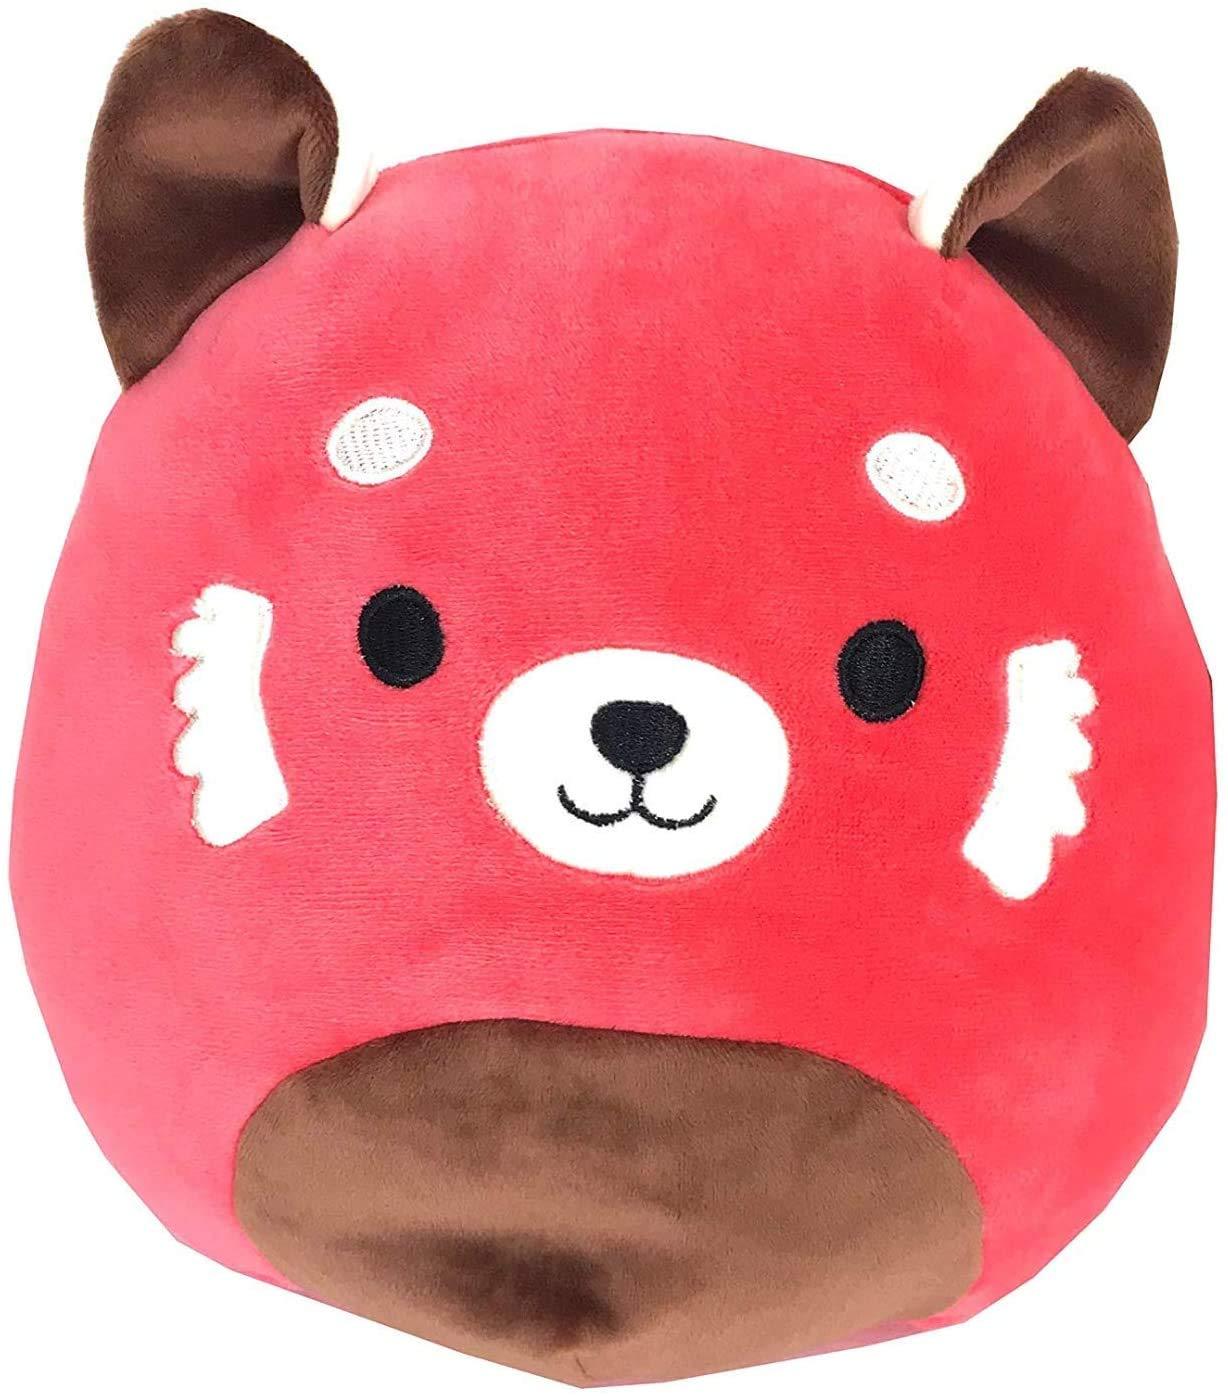 Squishmallow 8 Inch Red Panda Raccoon Stuffed Plush Toy